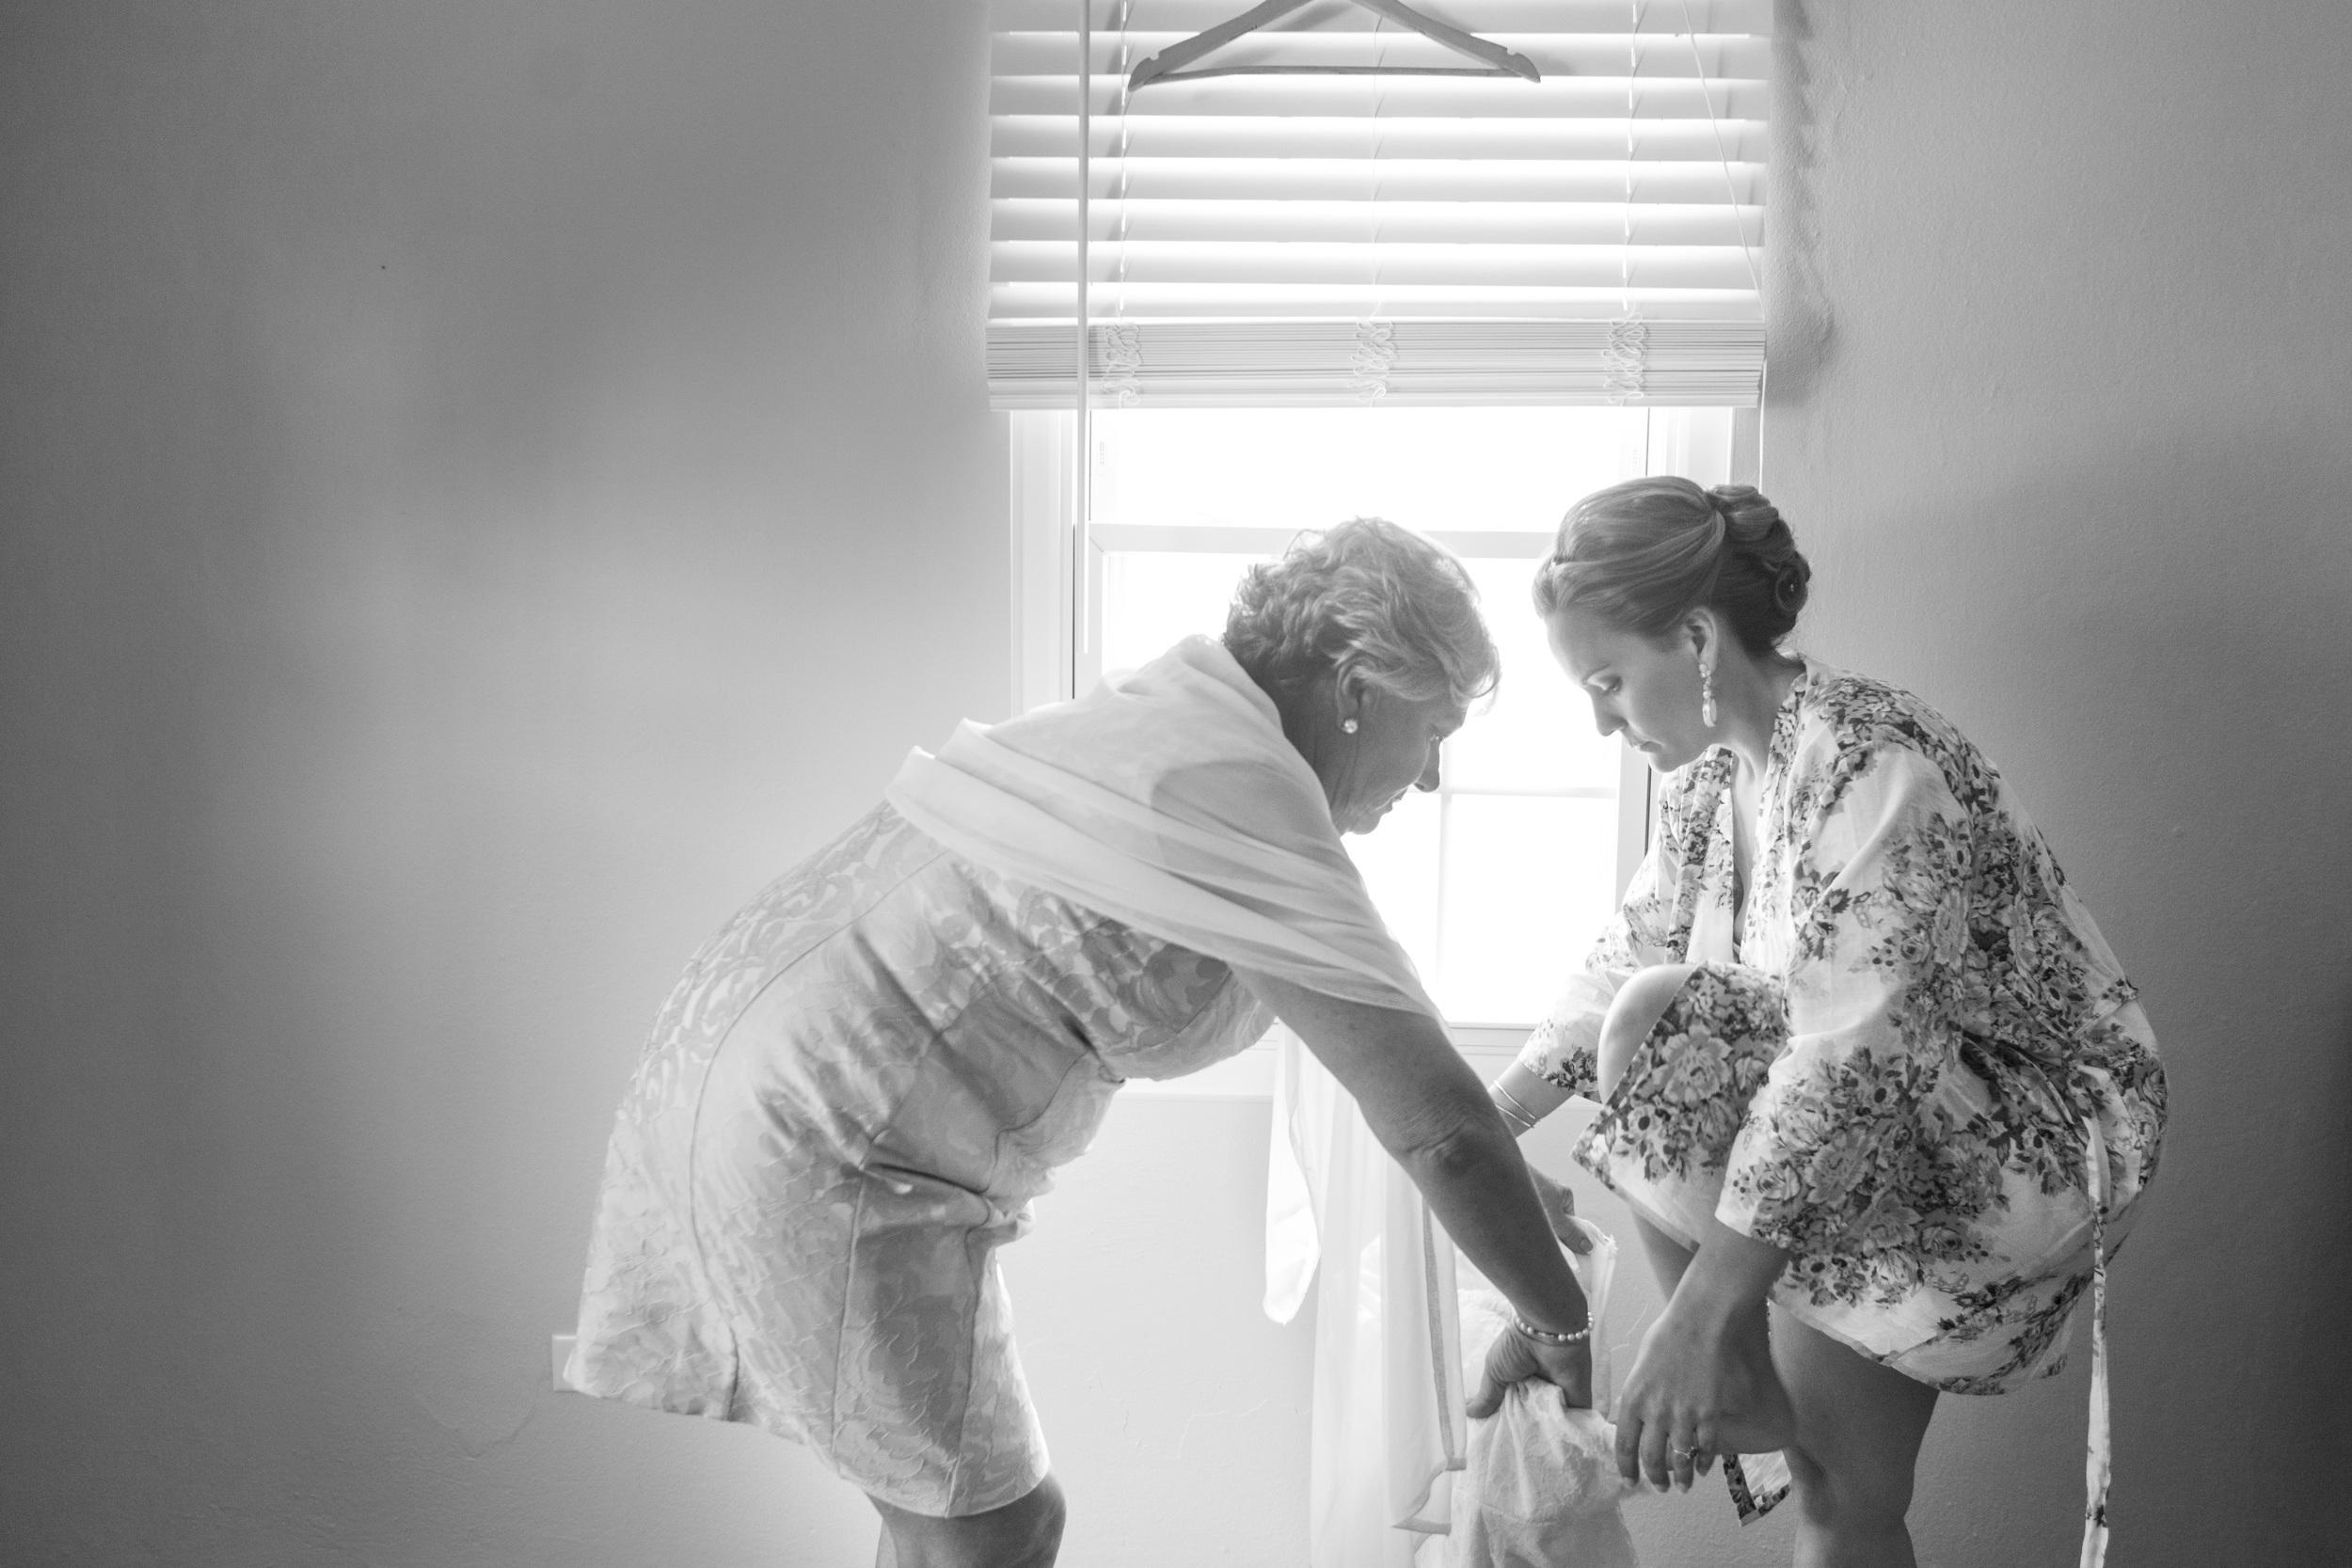 "Fiander, Melanie, from ""Fiander Foto: Weddings"" -  The Dress: Bride and Mother , 2015."